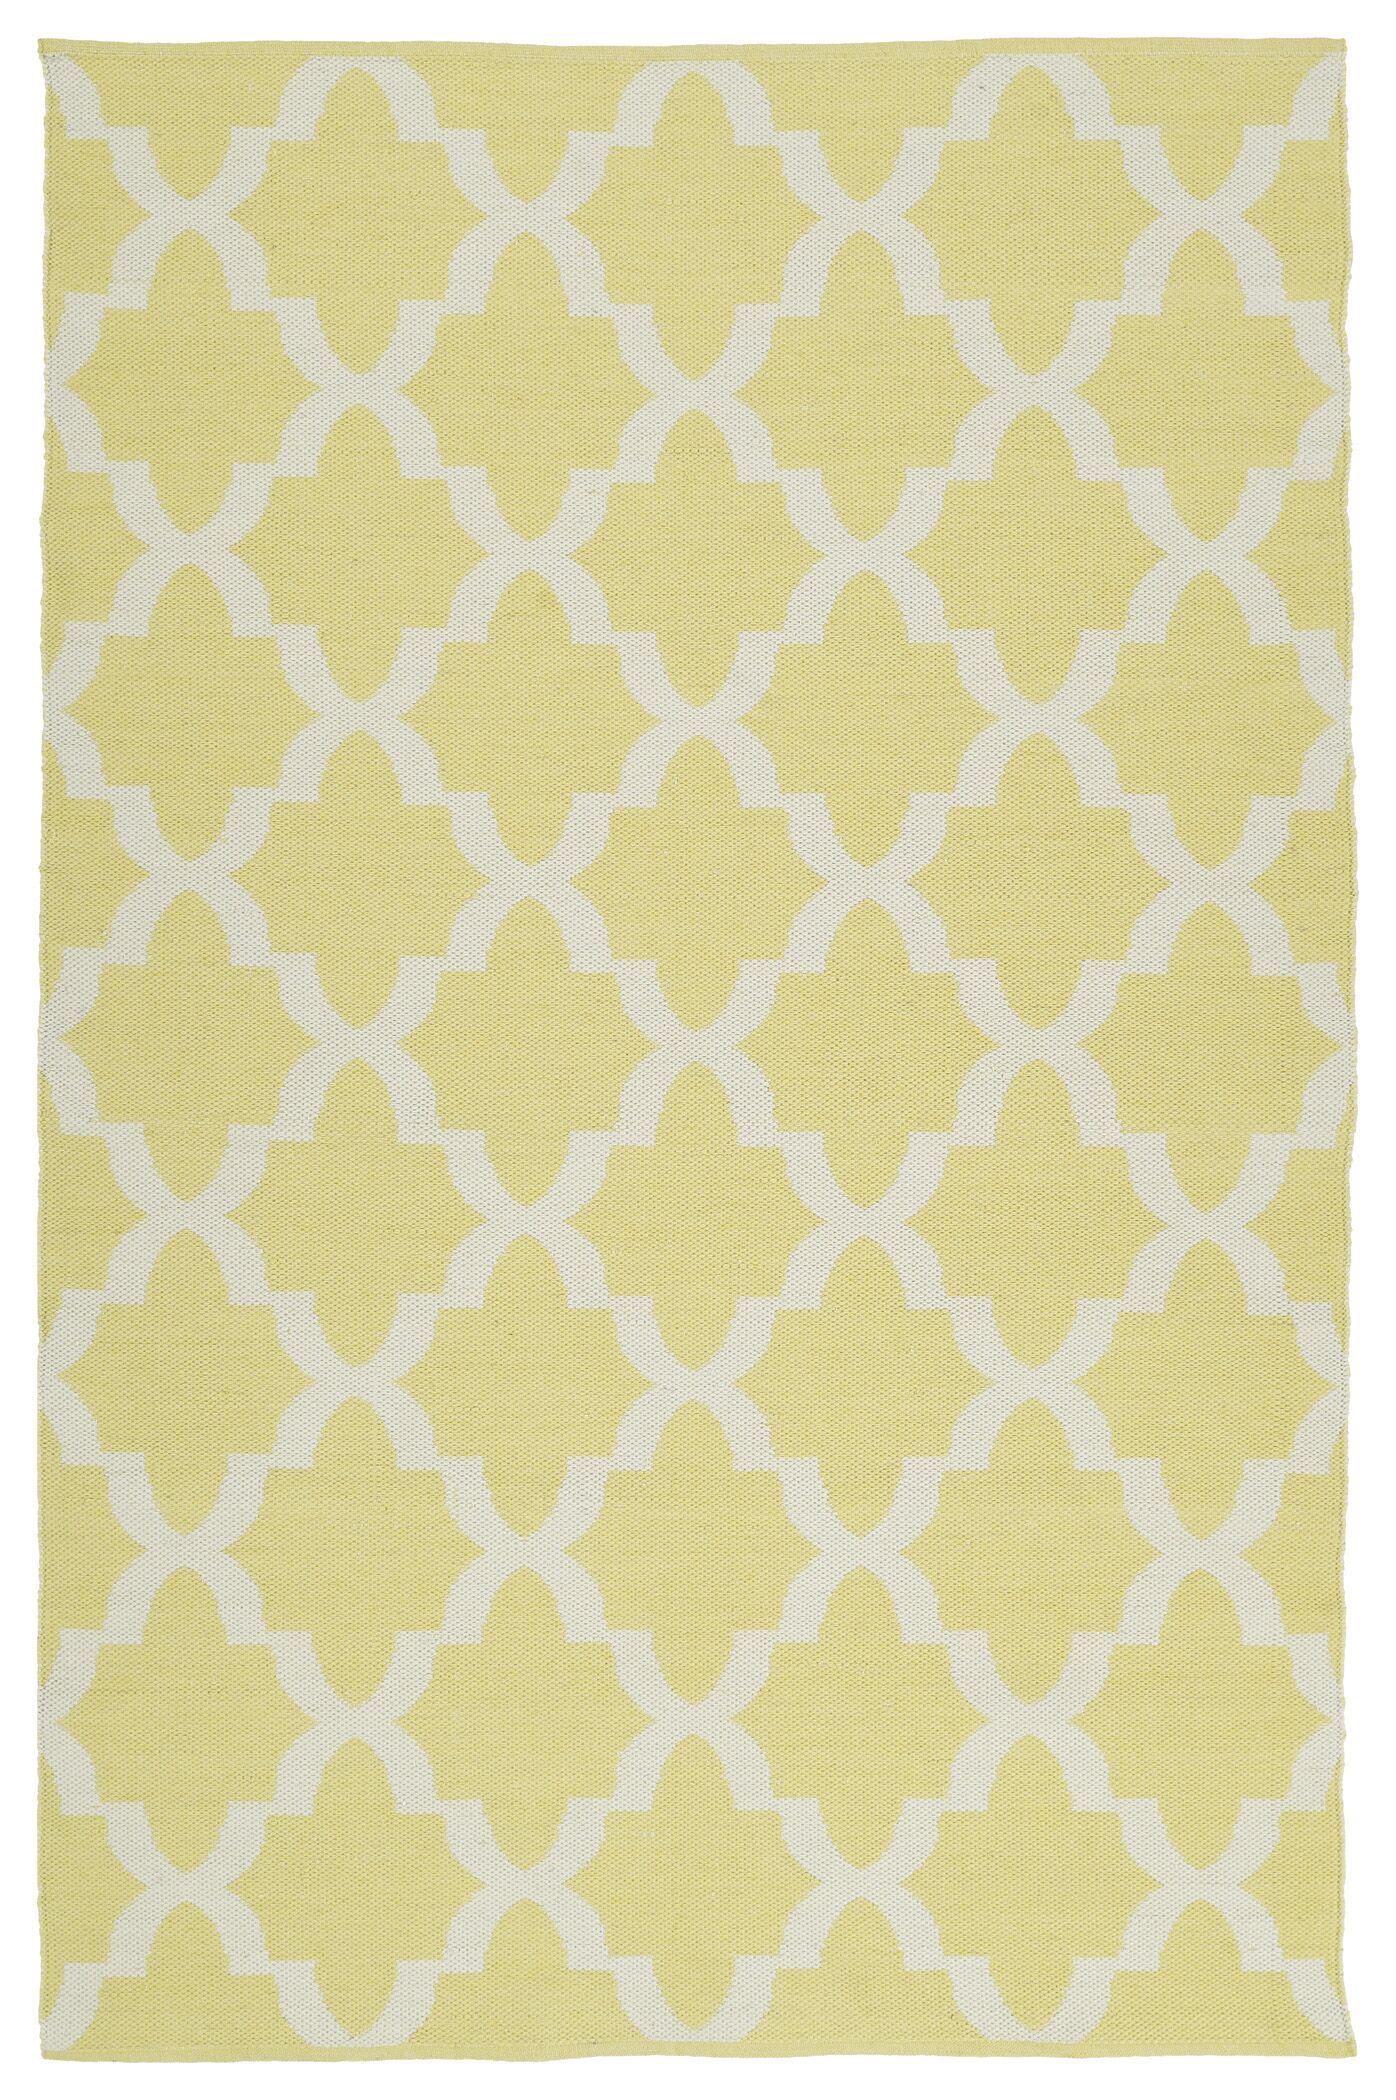 Covington YellowWhite IndoorOutdoor Area Rug Rug Size: Rectangle 9' x 12'